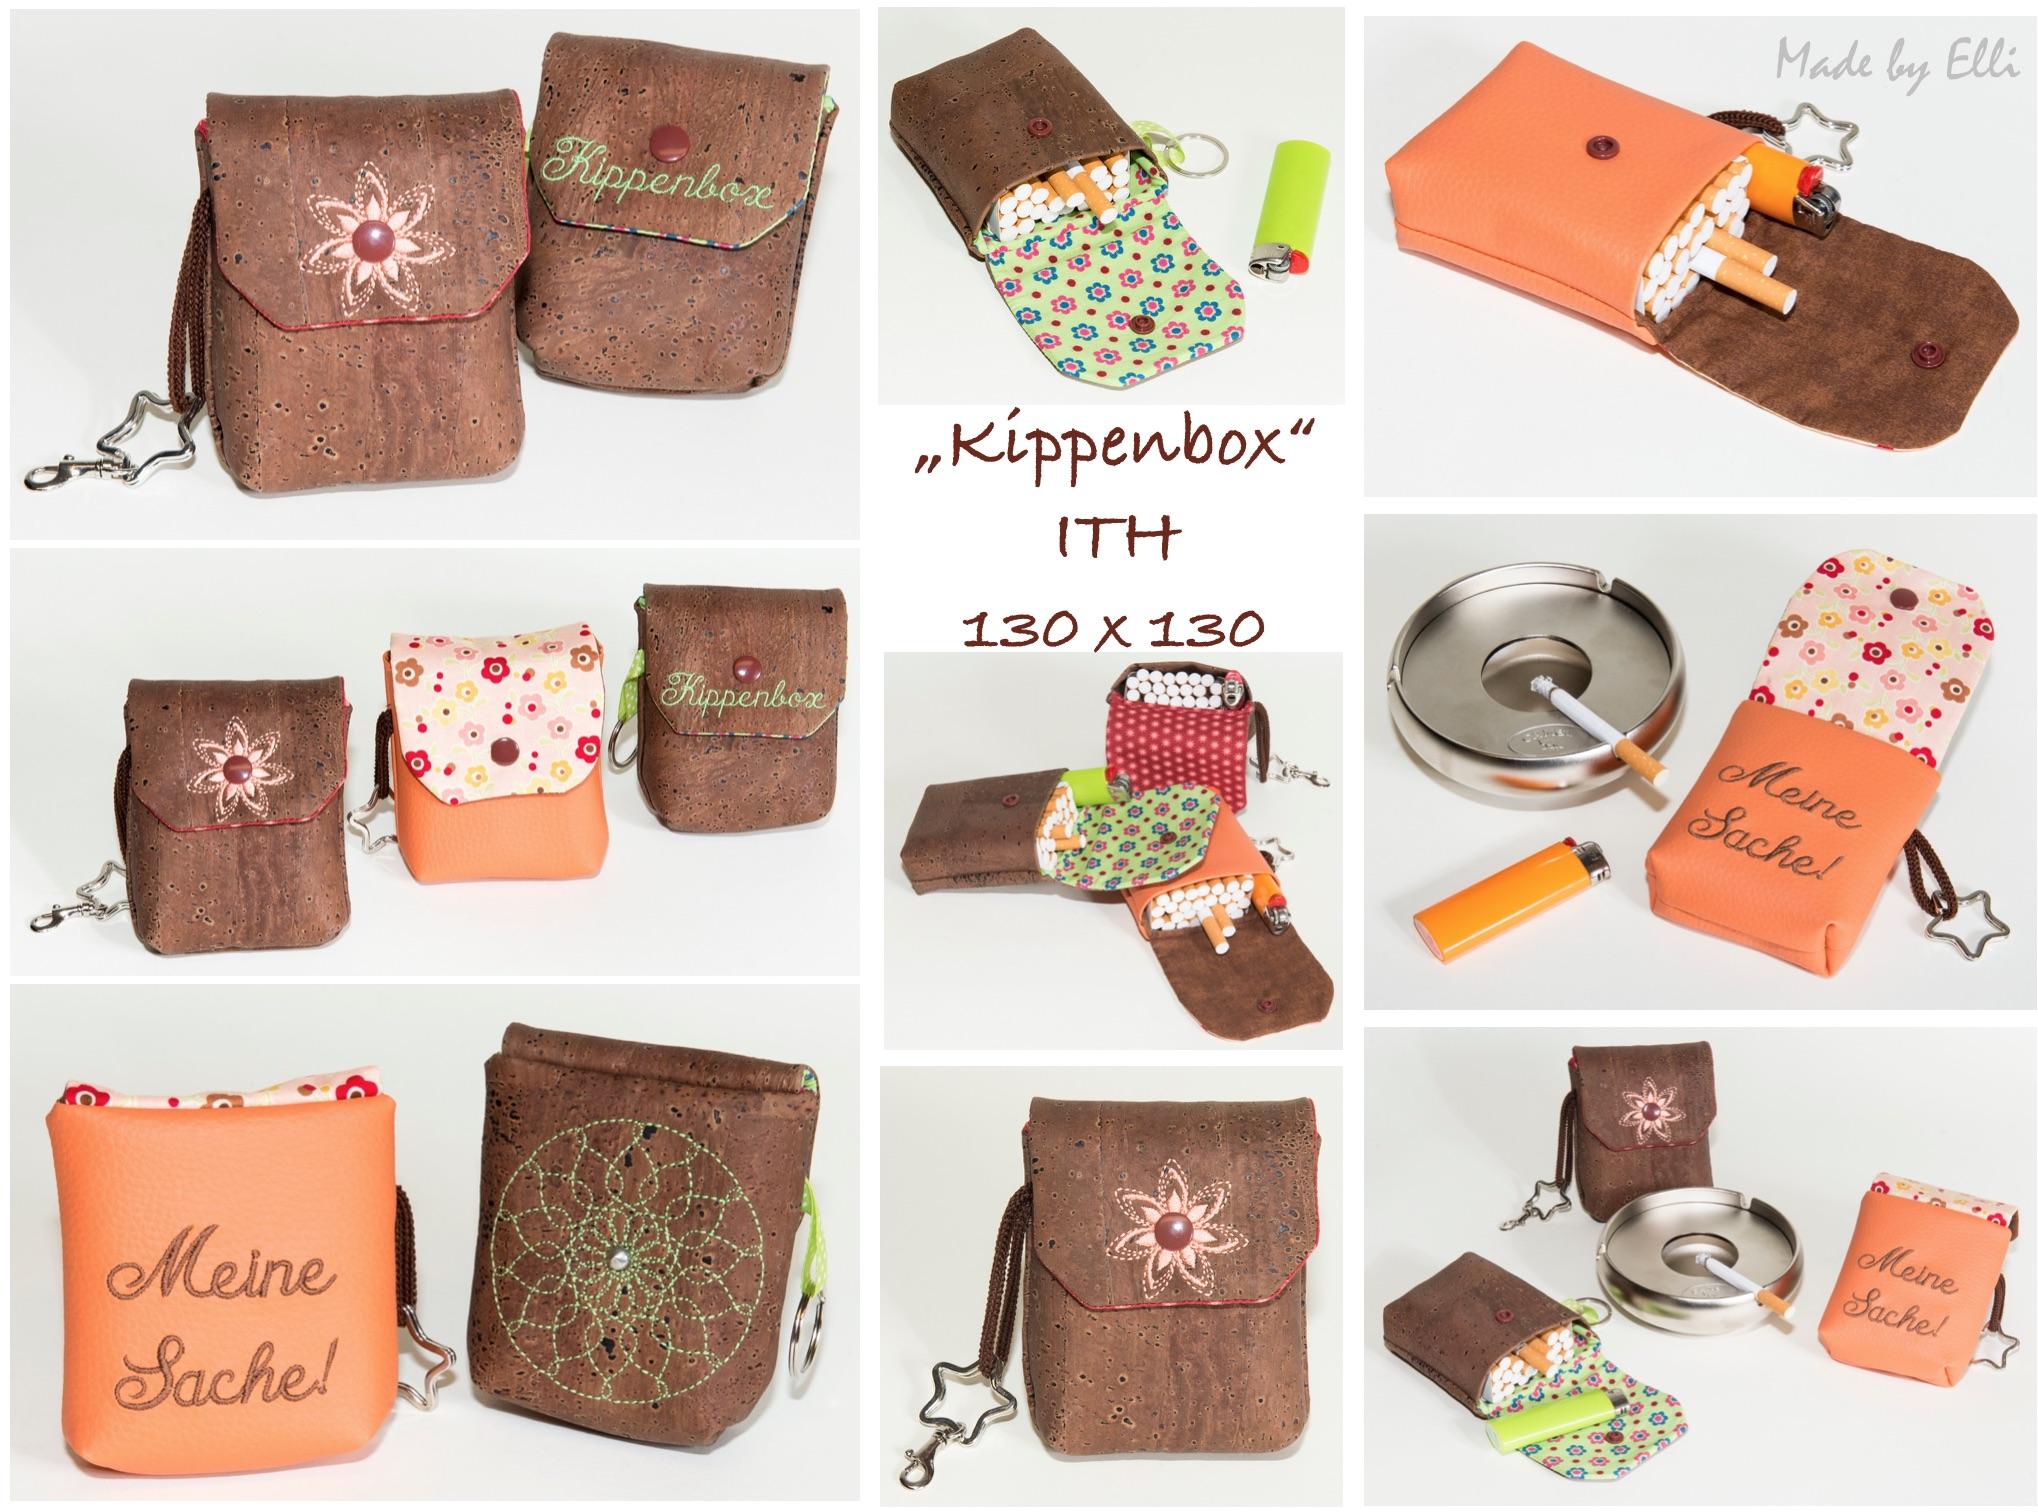 Kippenbox ITH 13x13